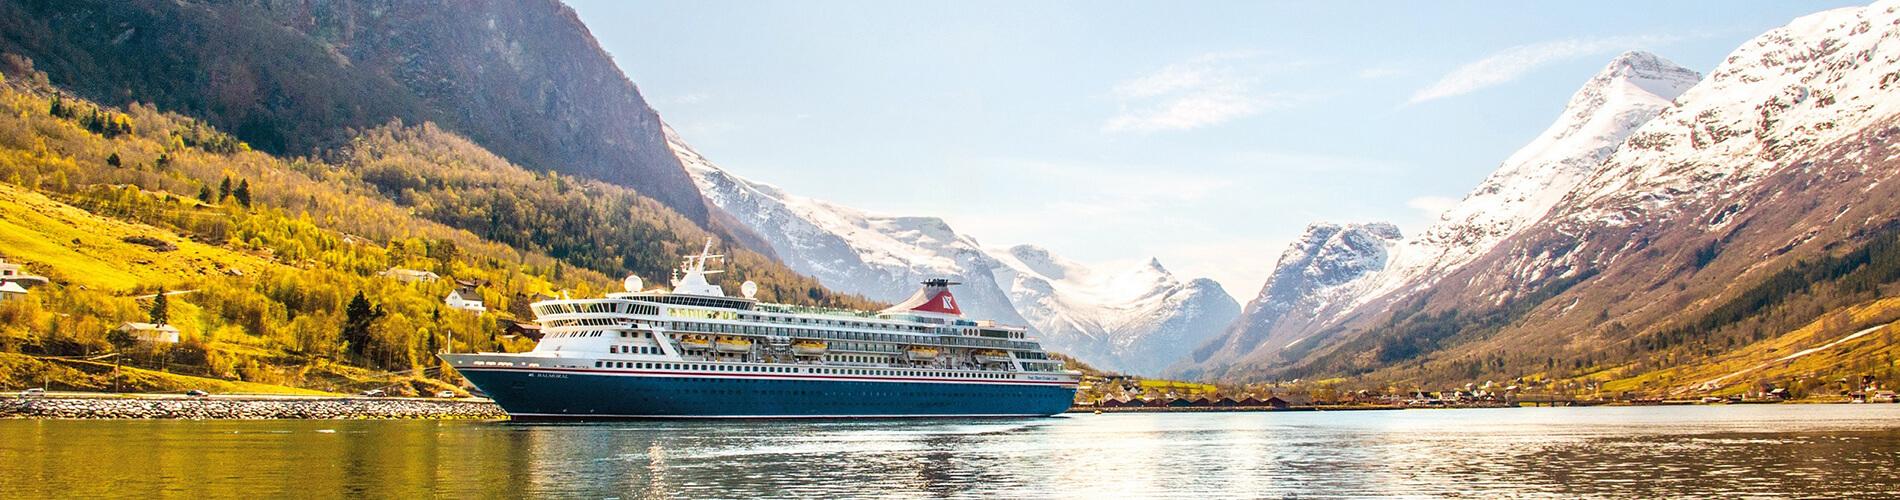 Balmoral-Olden-Norway